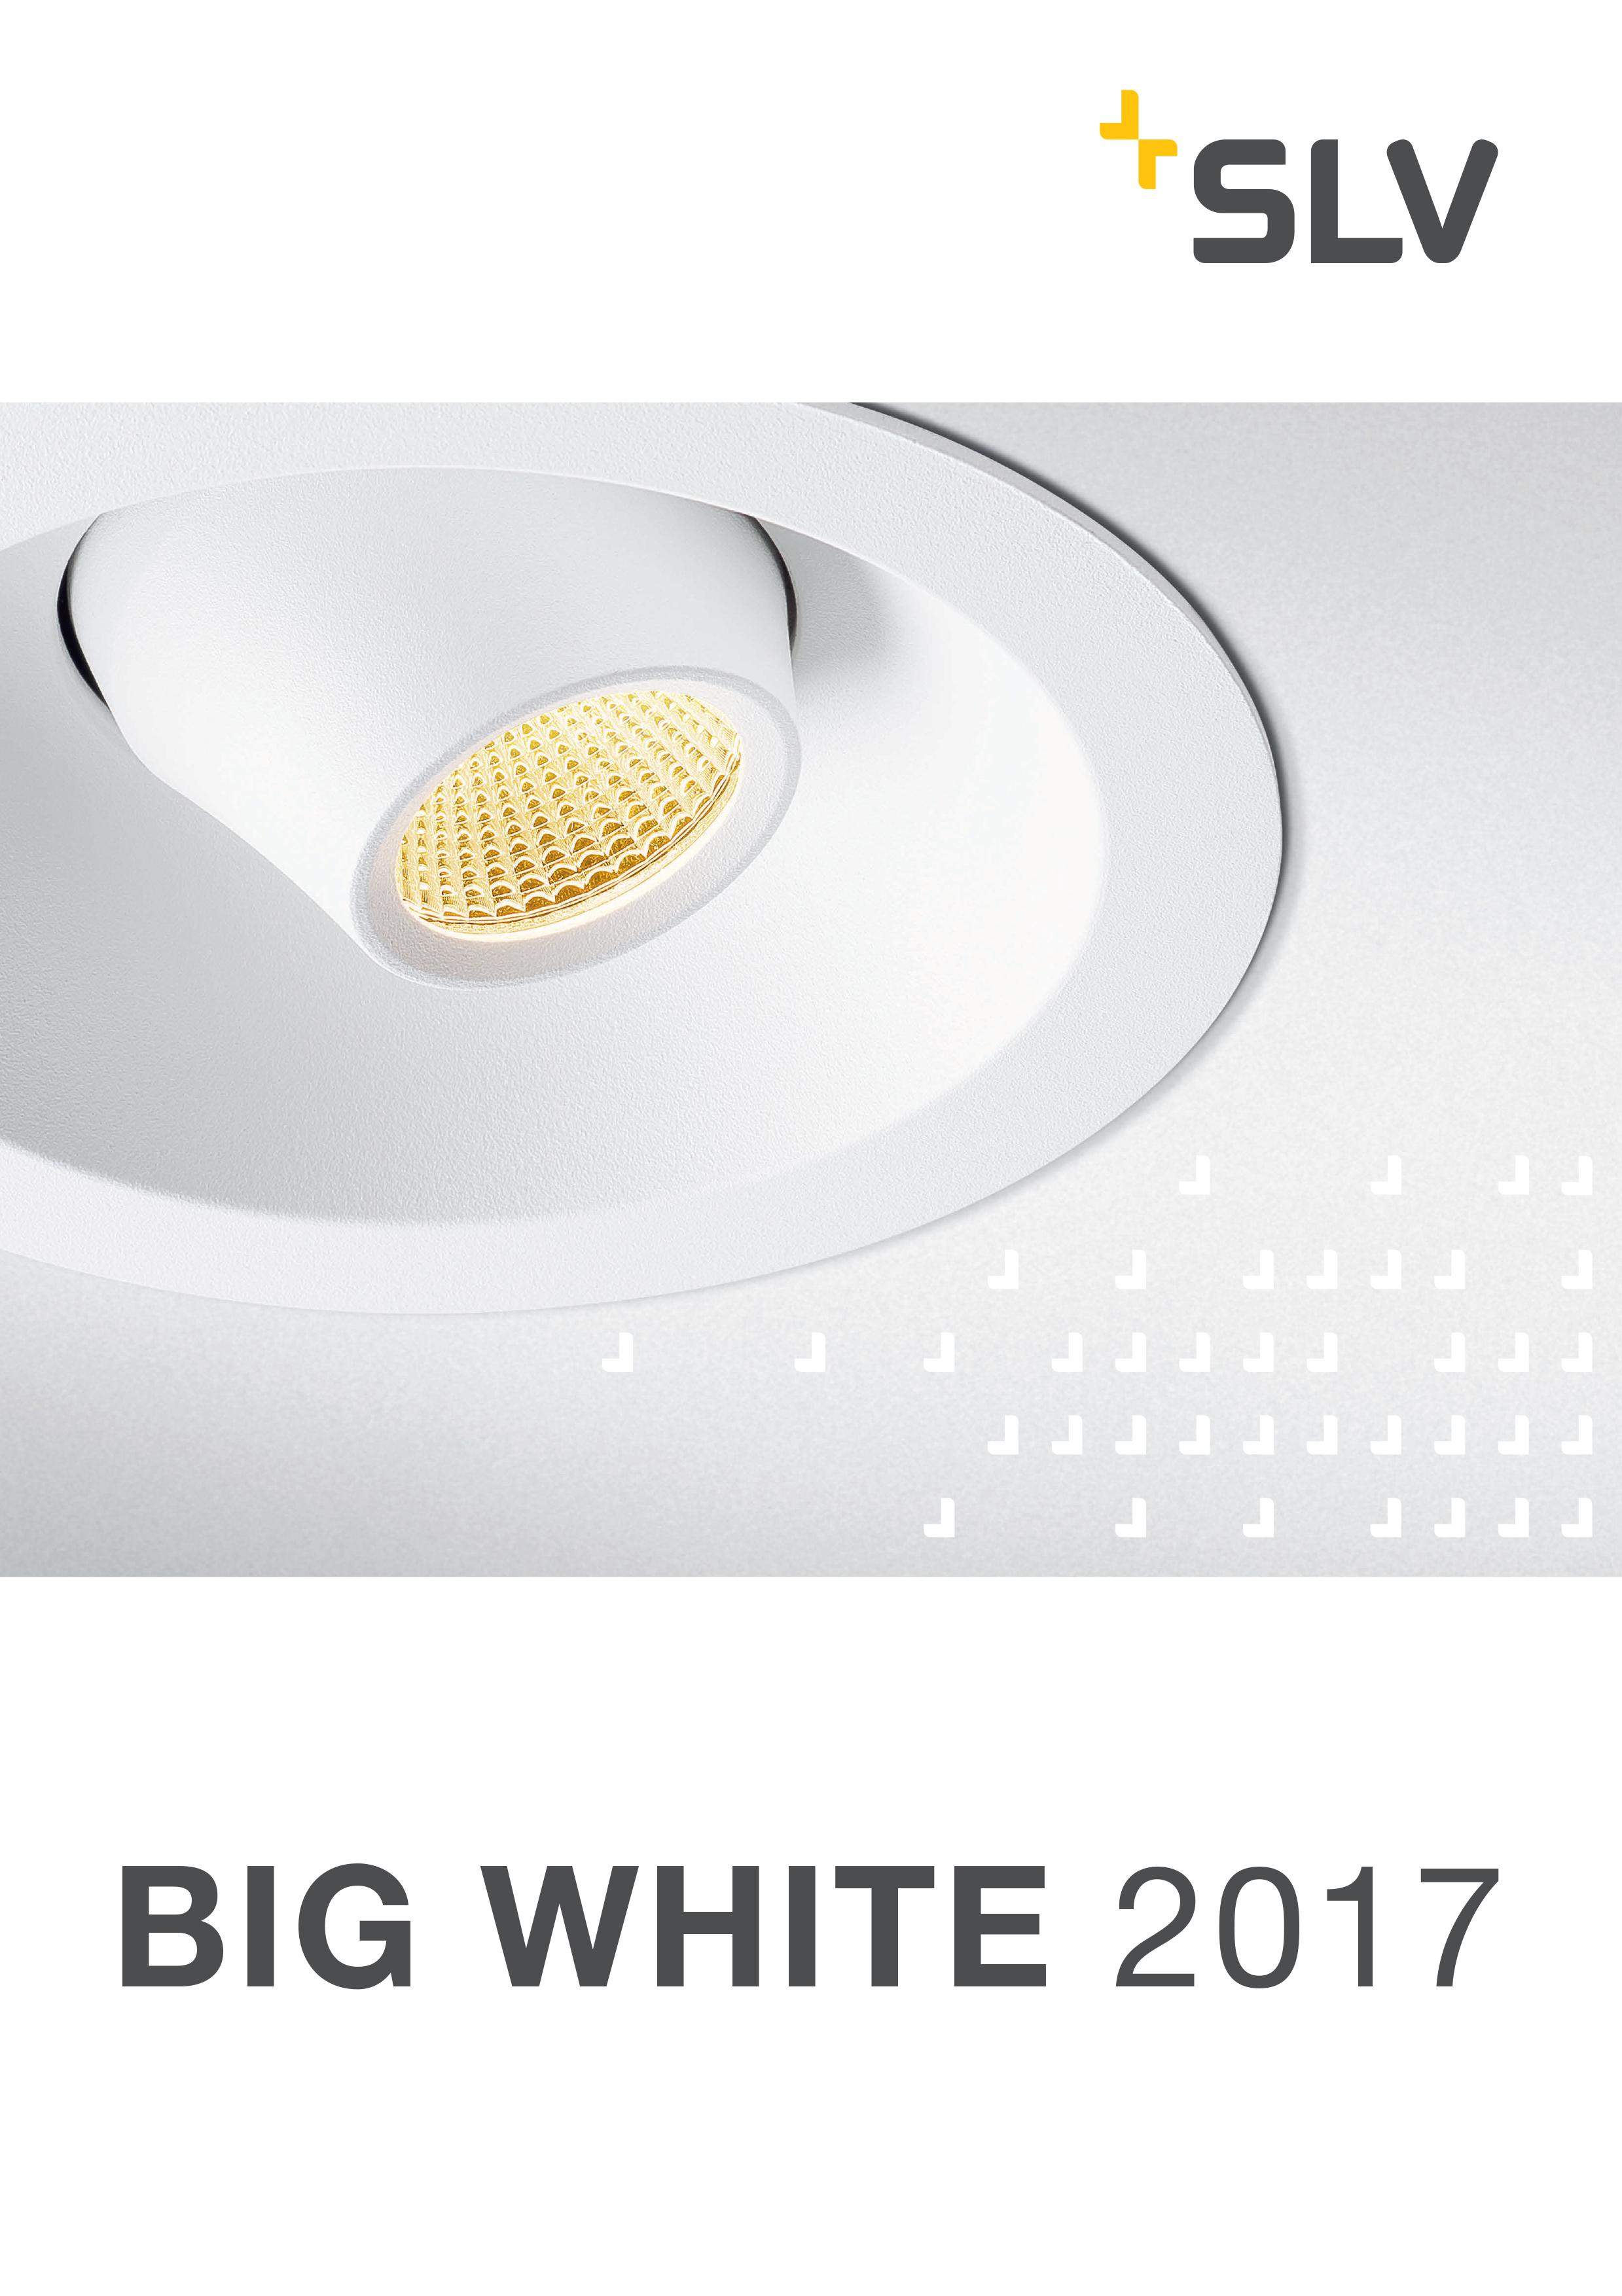 nieuwe catalogus van slv big white 2017